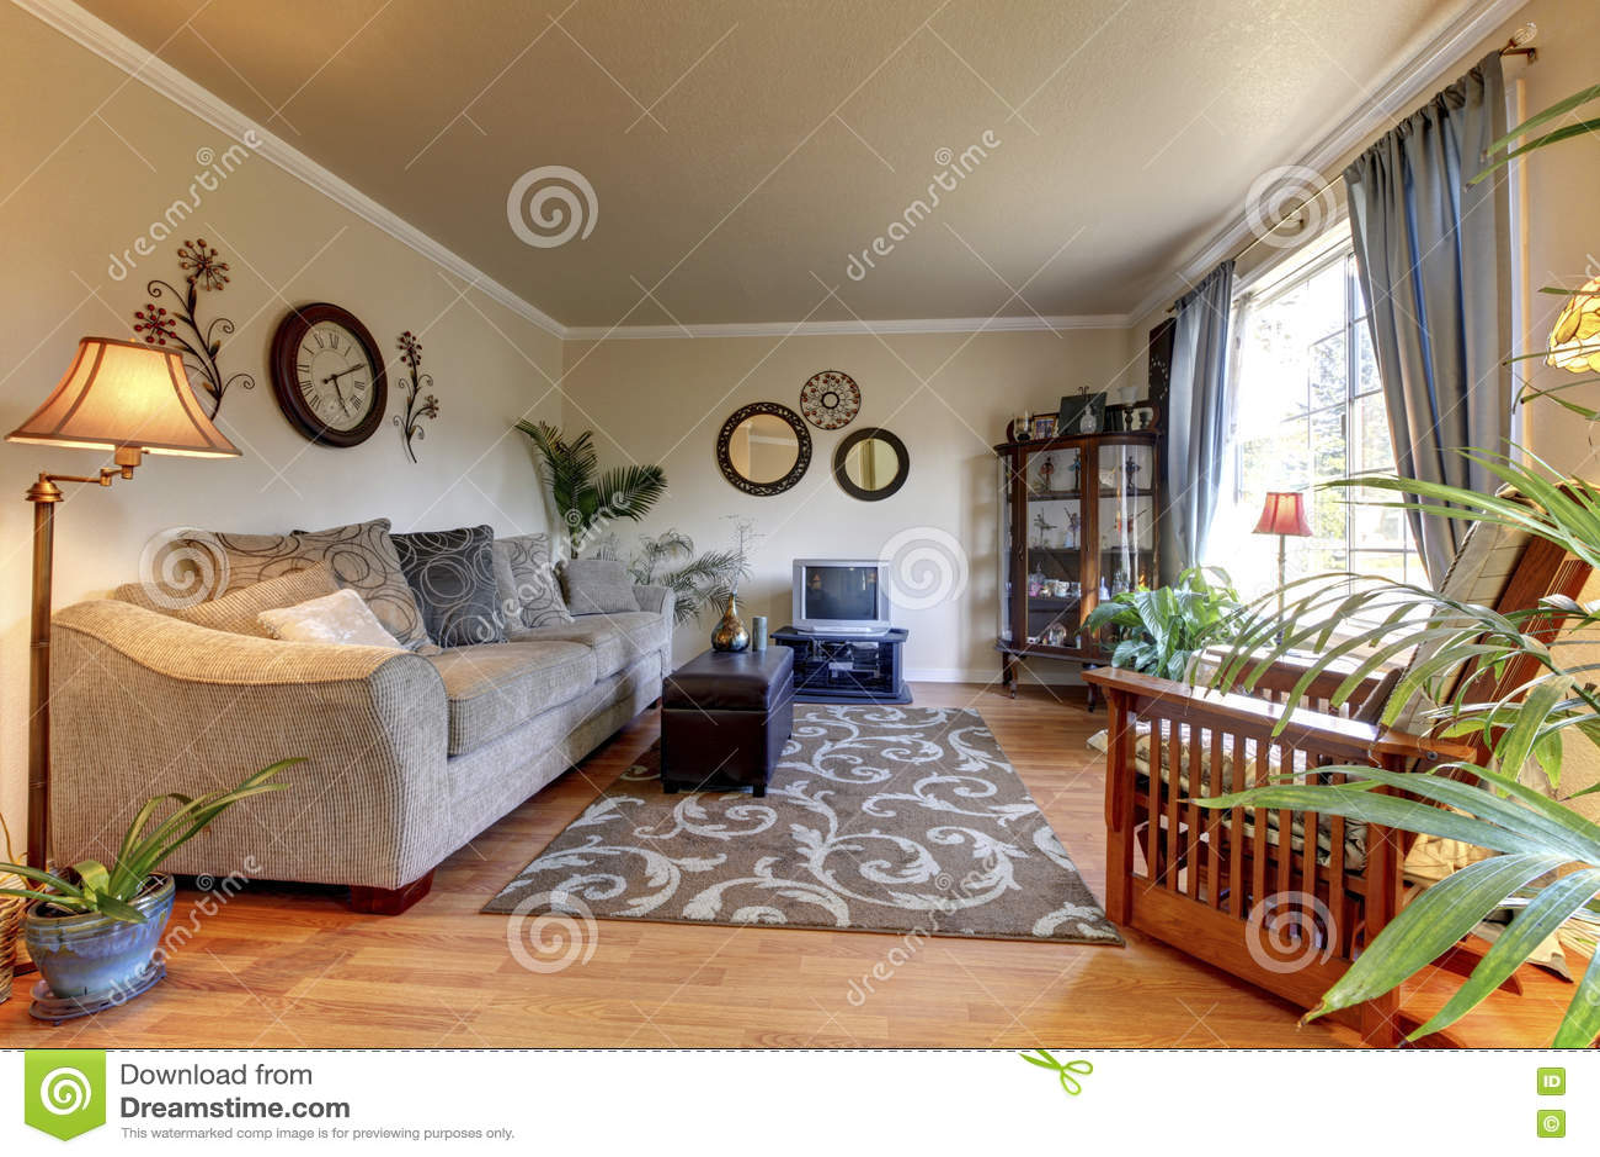 cozy living room design with nice decor large beige sofa stock photo image of decor. Black Bedroom Furniture Sets. Home Design Ideas